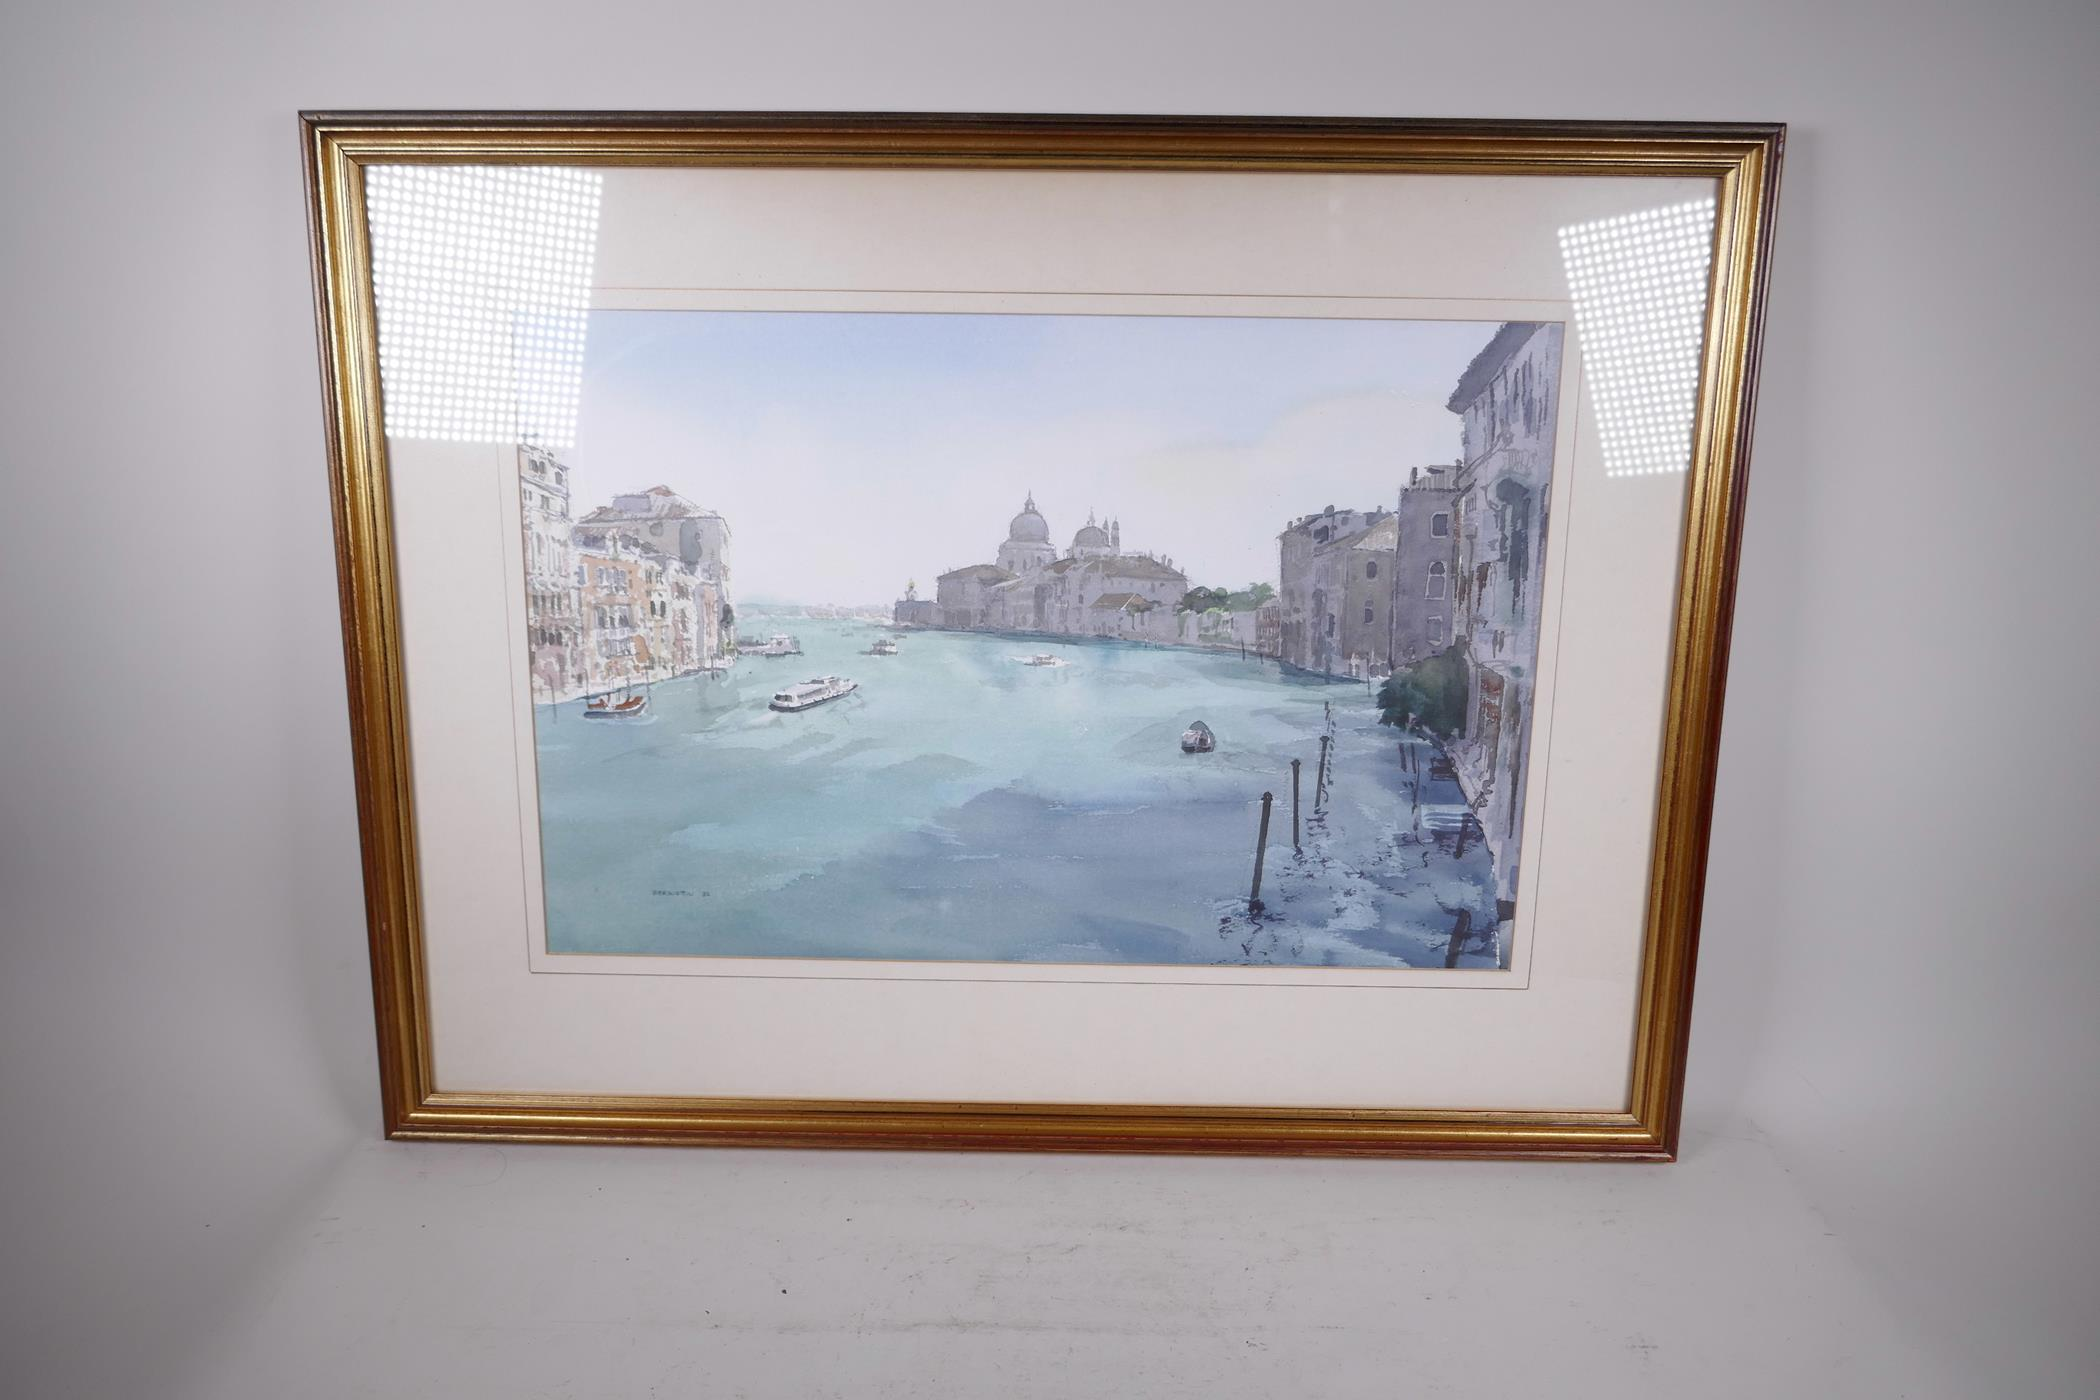 "Berrington, Venetian scene, signed and dated '82, watercolour, 21"" x 13½"" - Image 2 of 3"